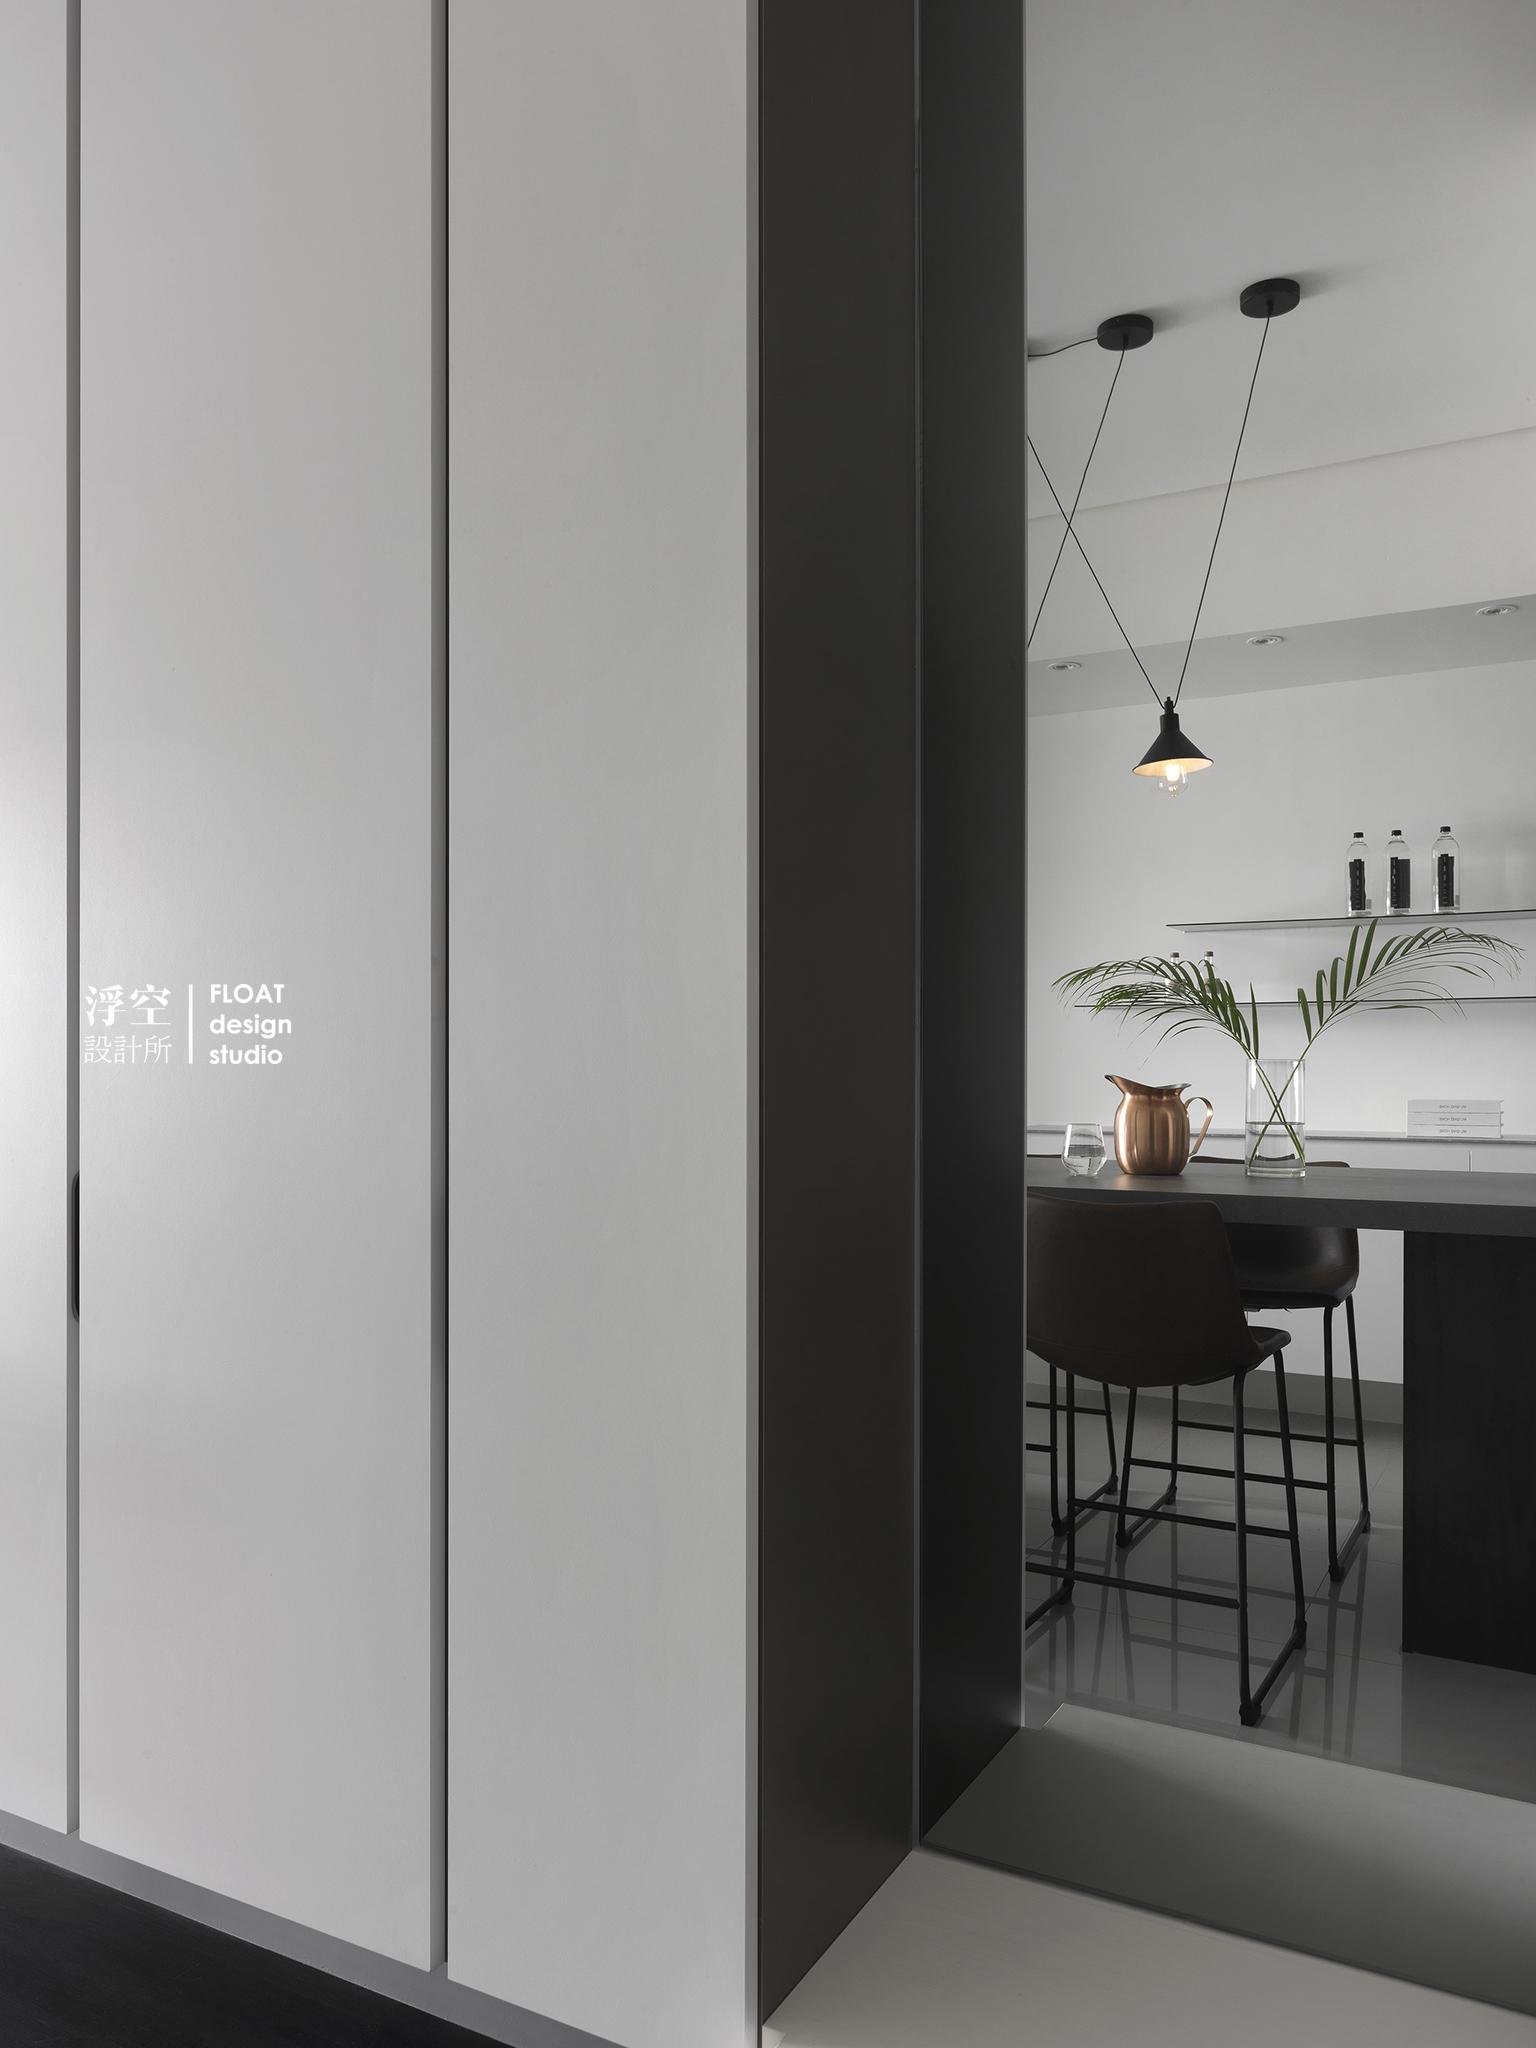 H L House Float Design Studio